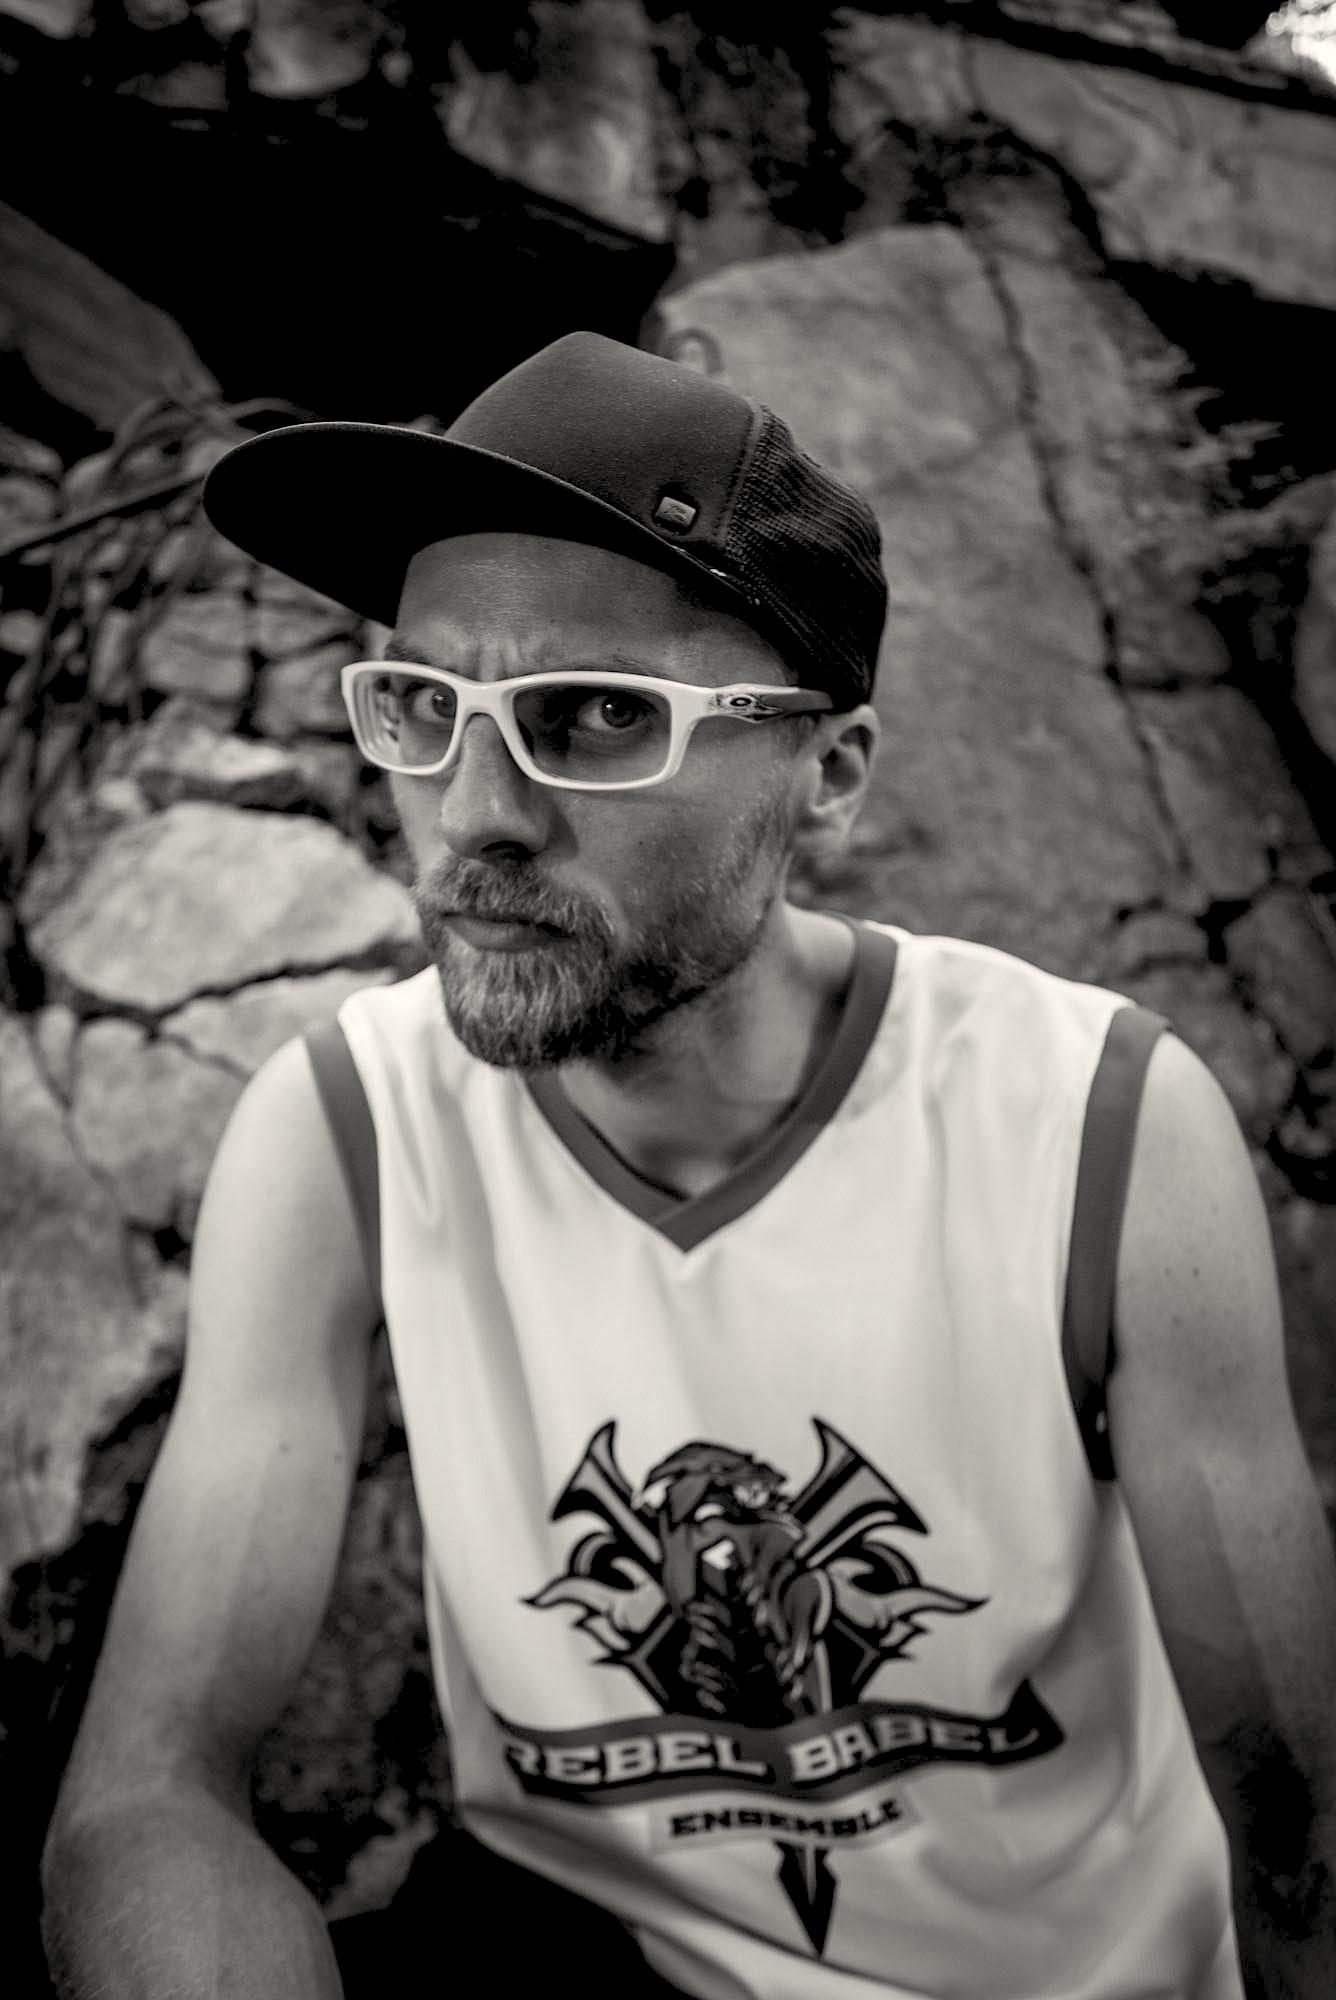 Zdjęcia z klipu Rebel babel Manifest na Westerplatte